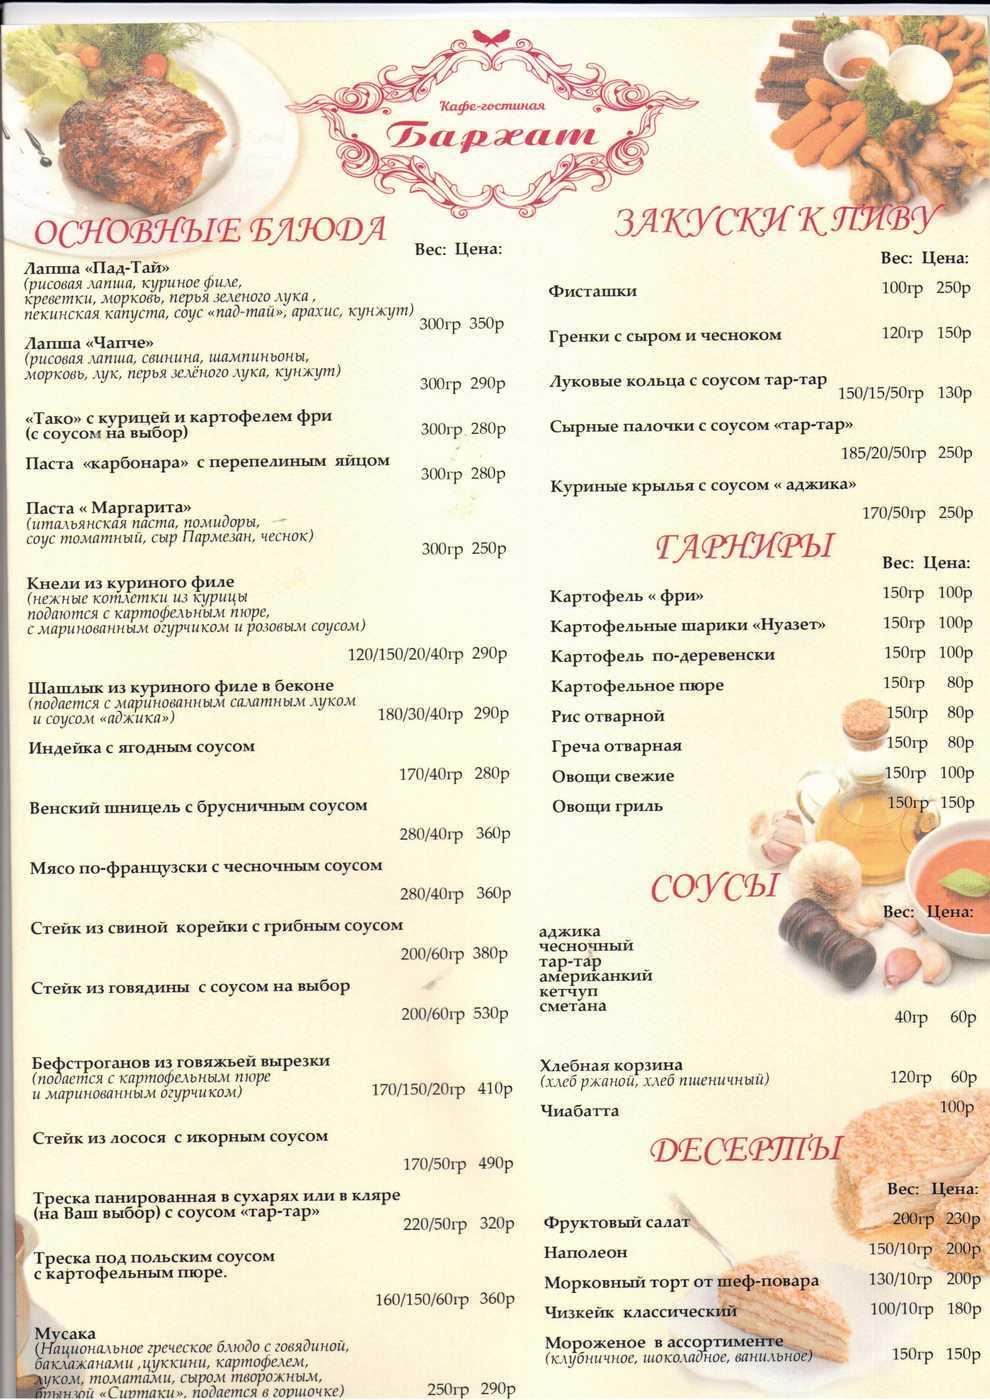 Меню кафе Бархат на Литейном проспекте